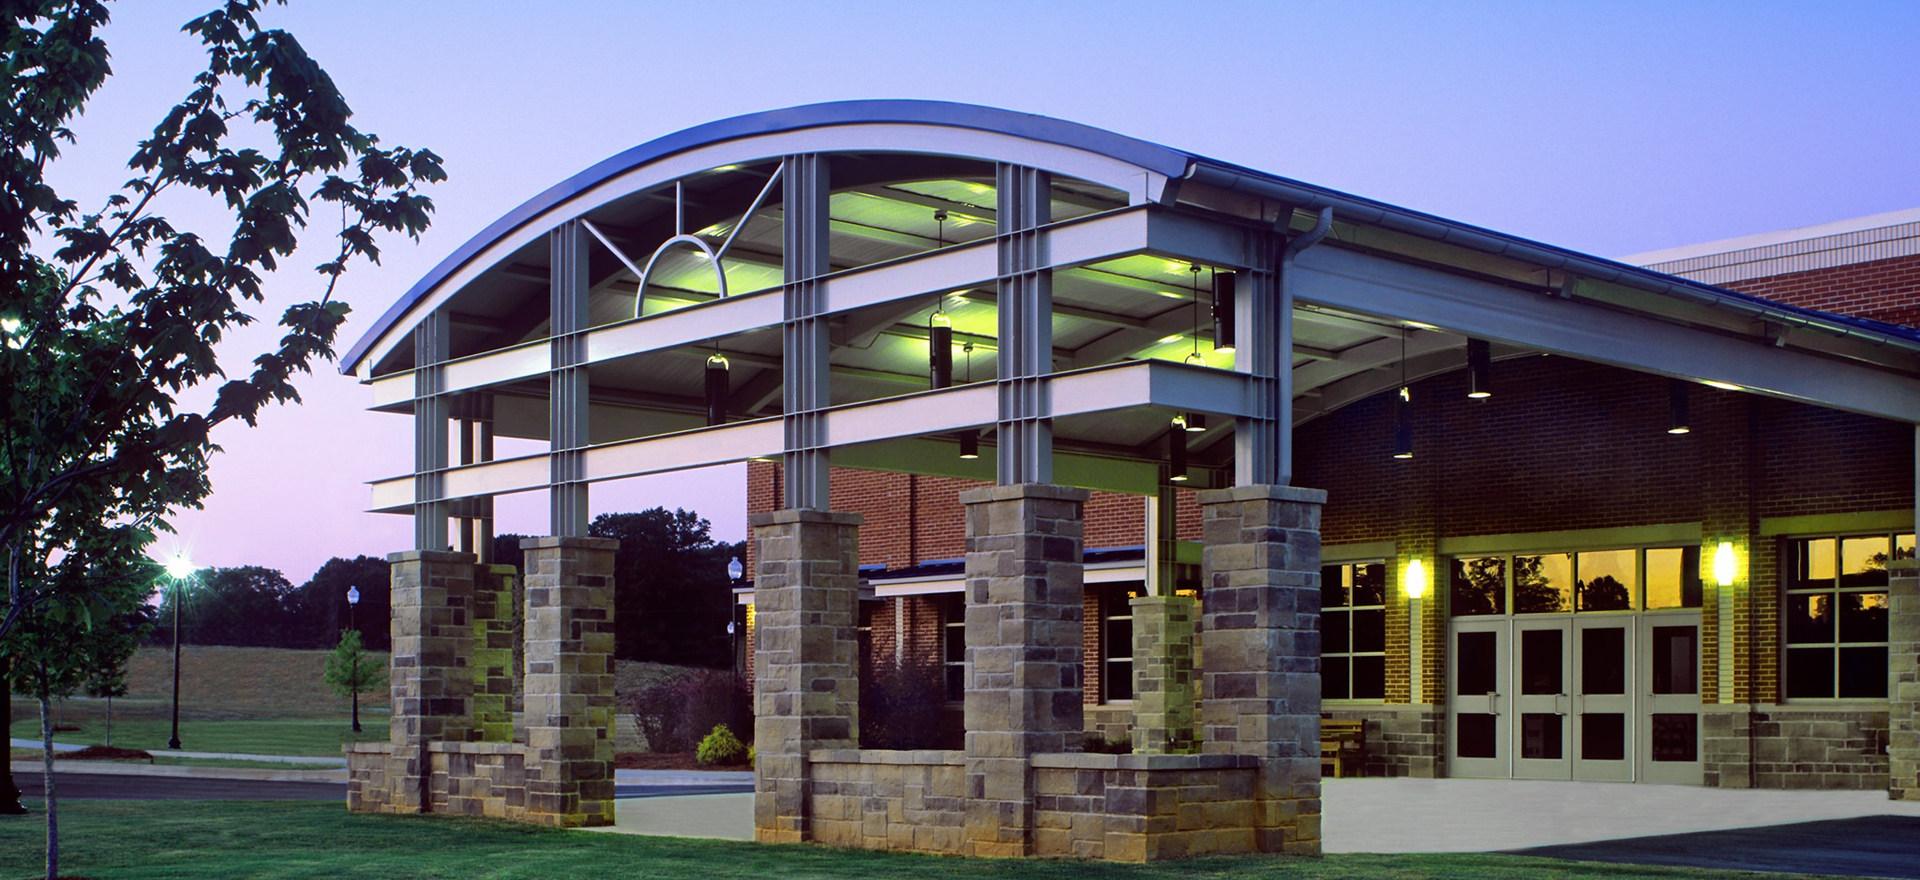 Spalding County Senior Center